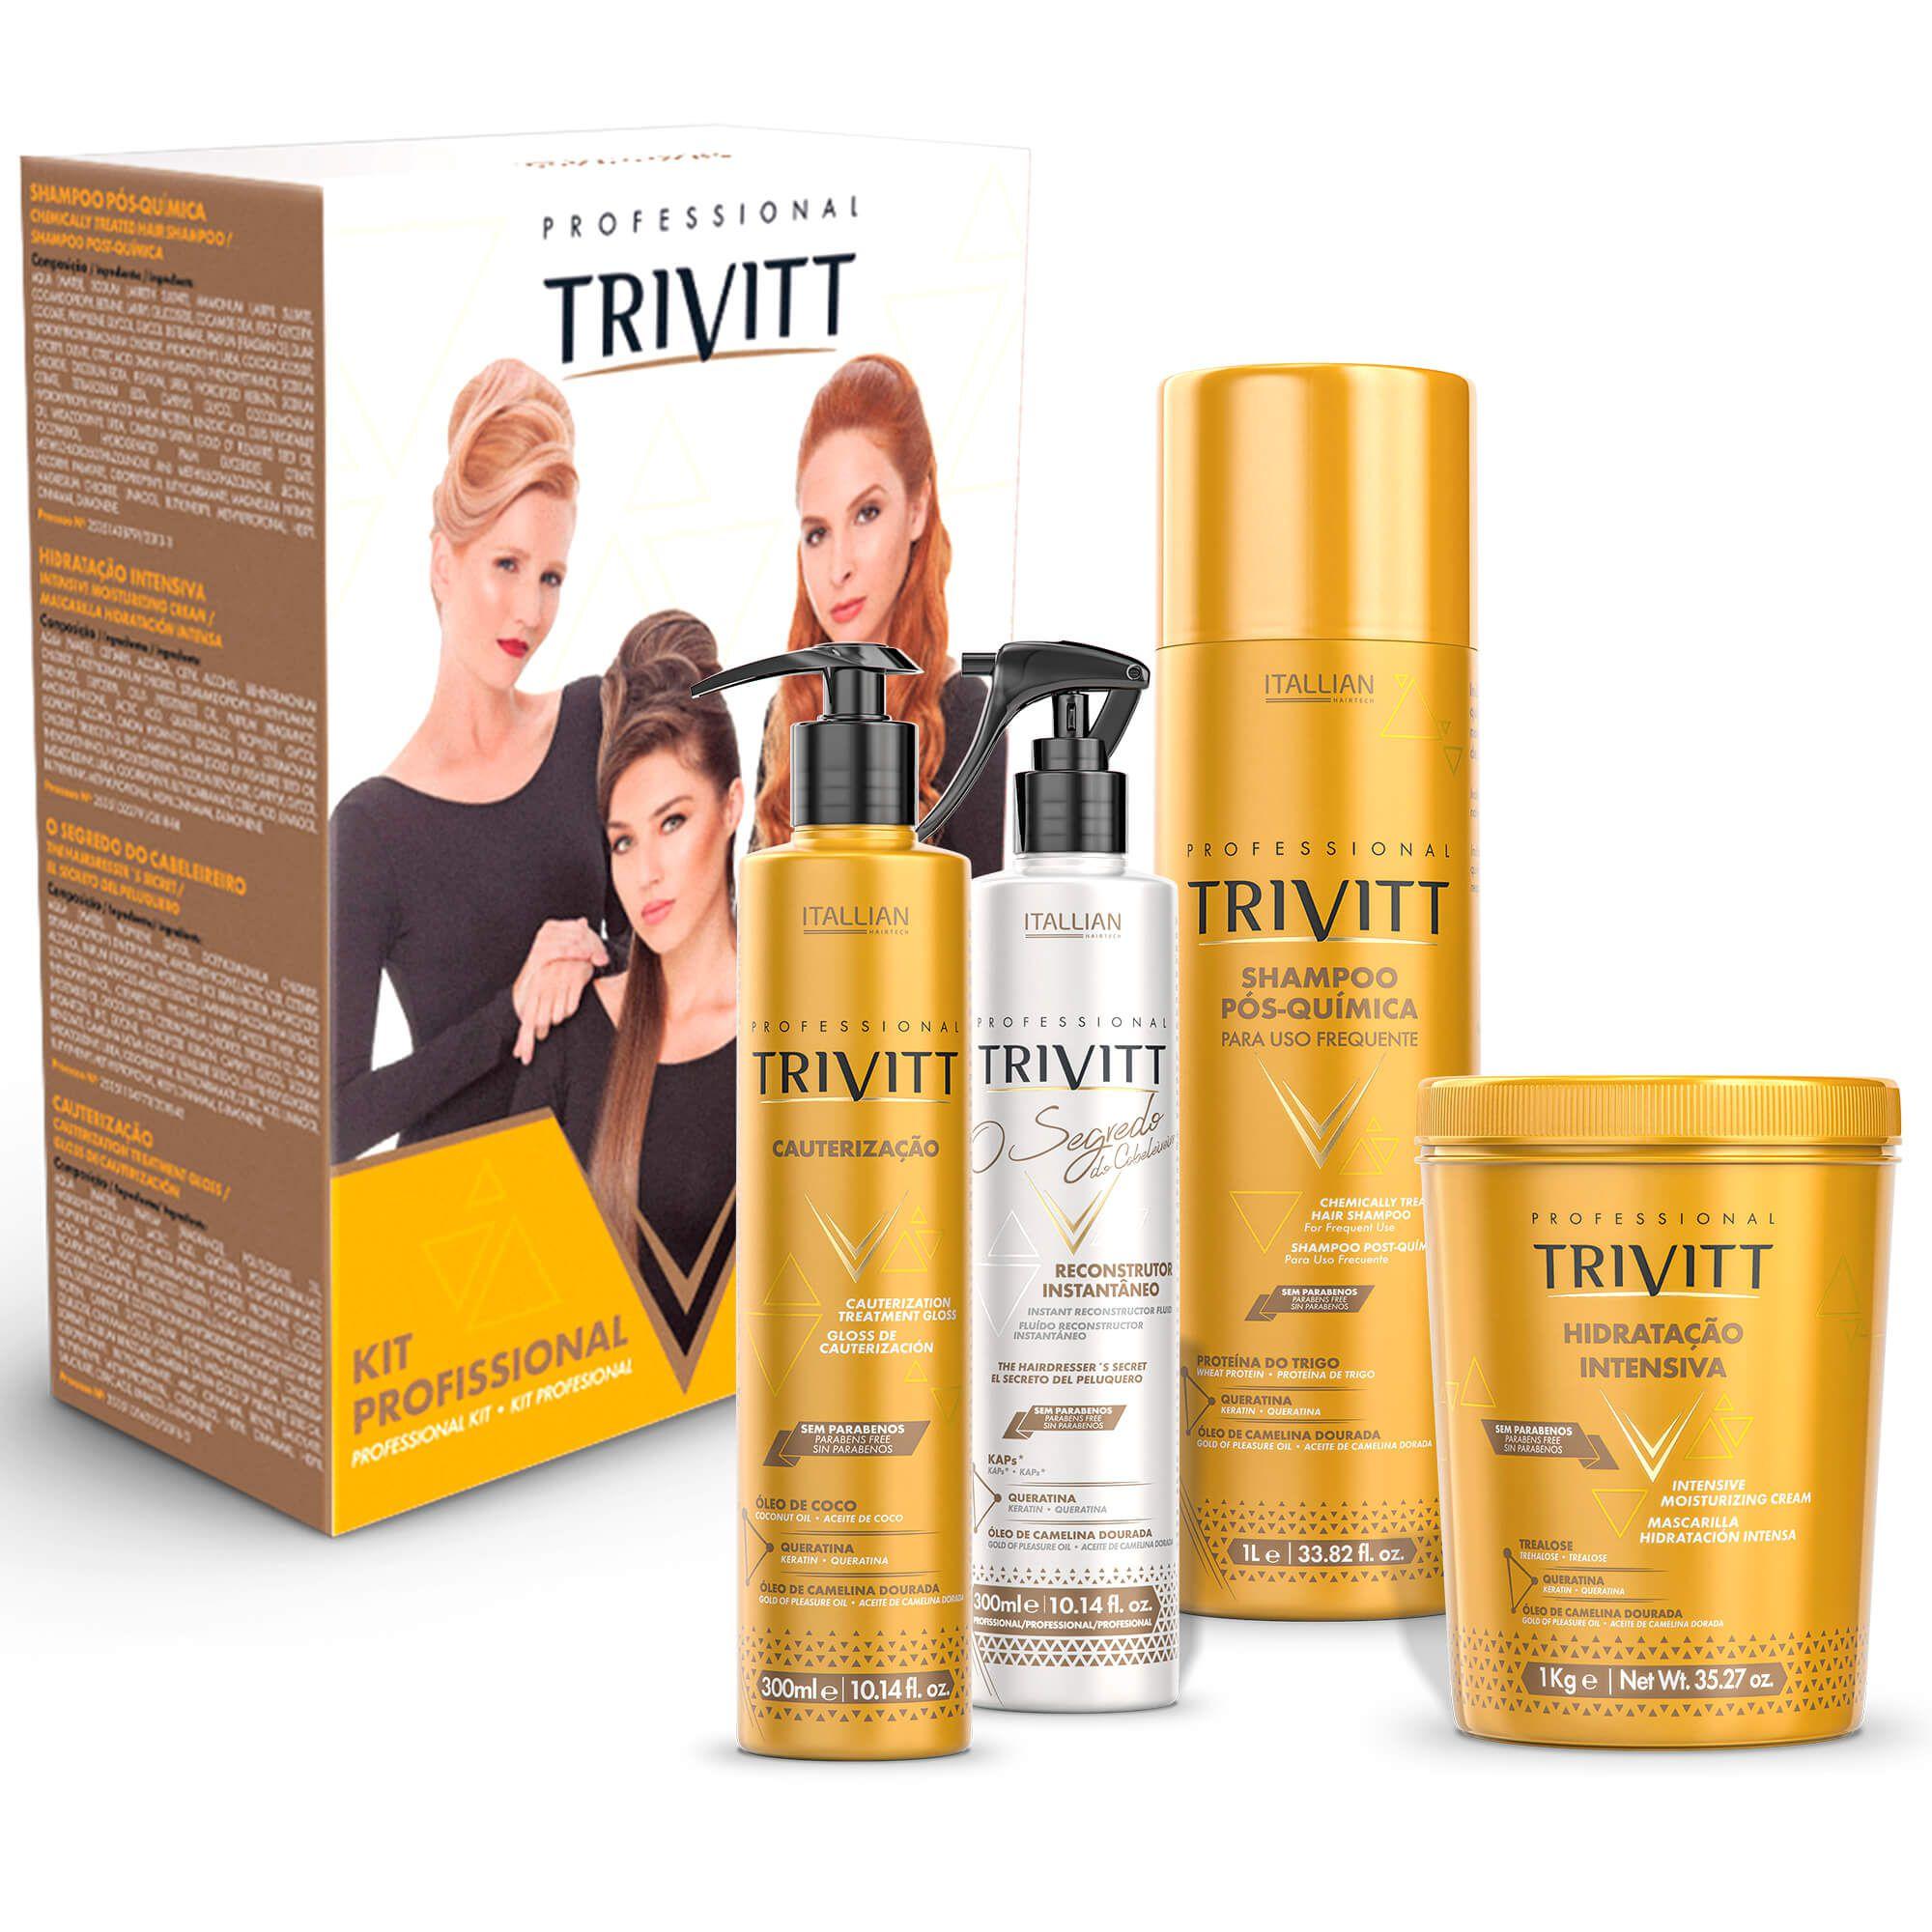 Kit Profissional Trivitt 2018 Hidratação + Fluido